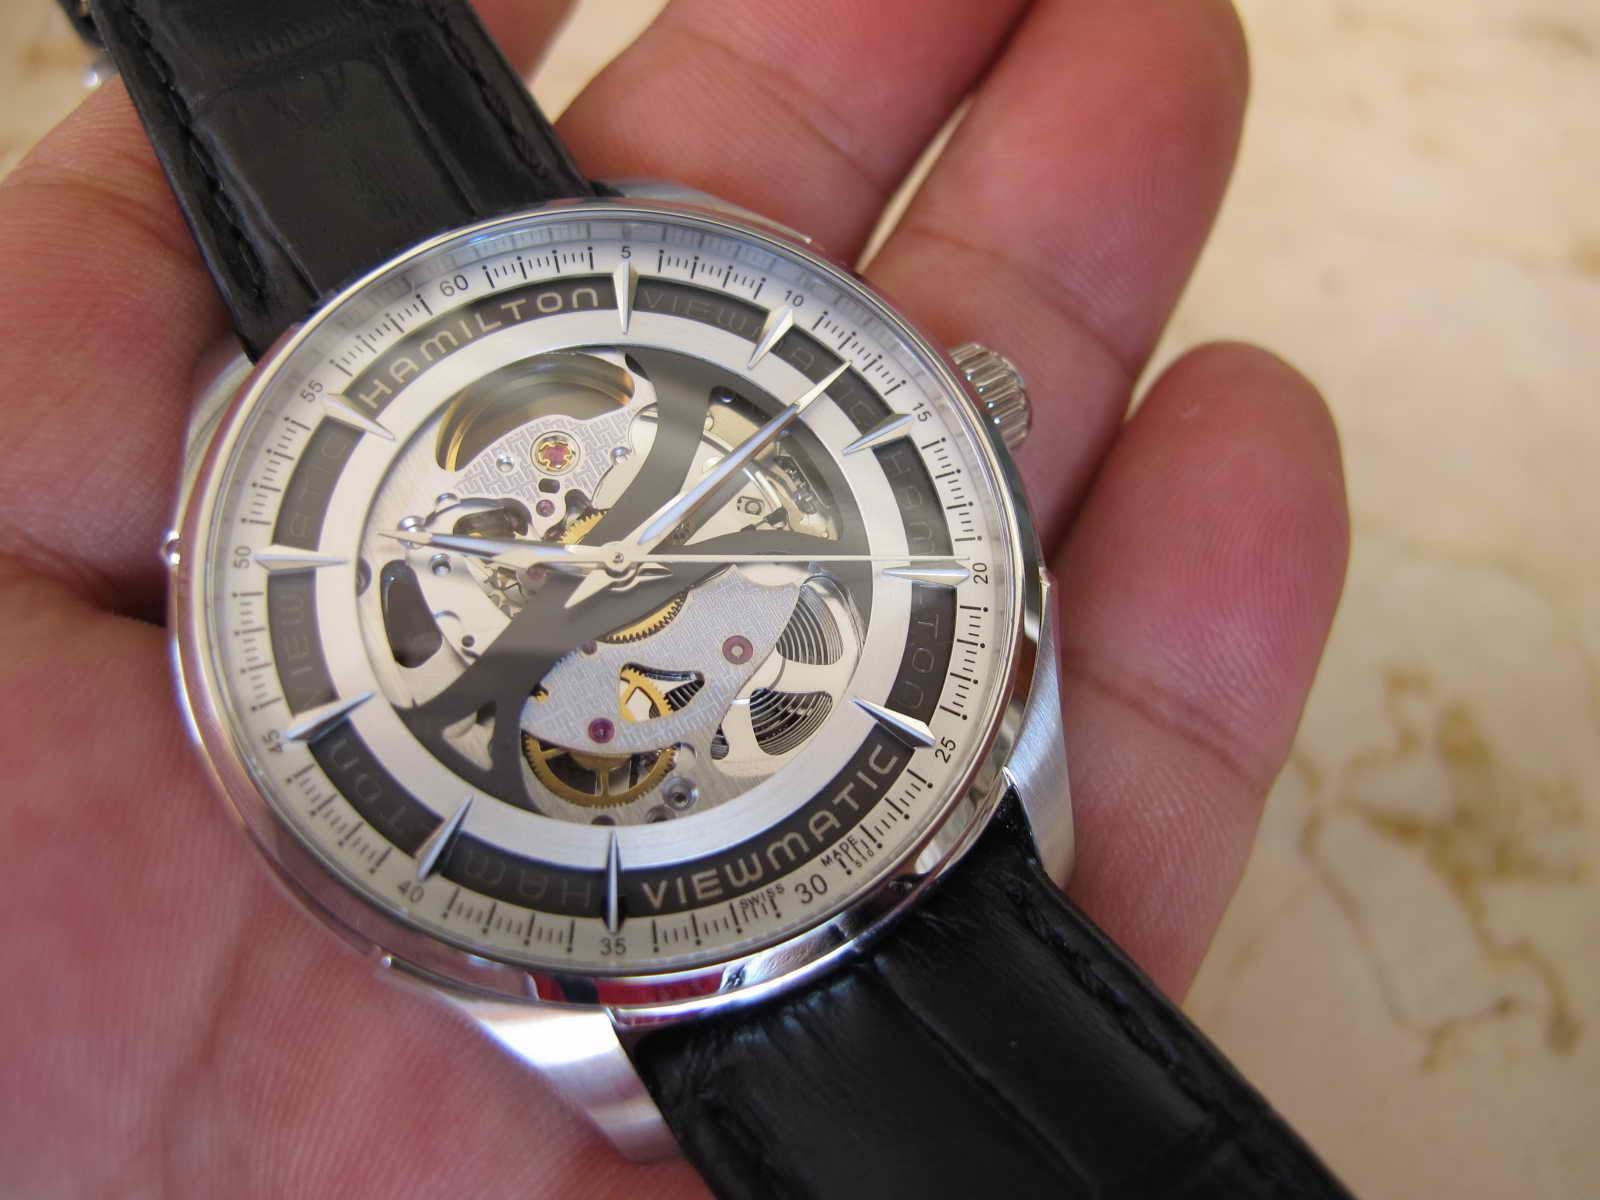 Lengkap dengan box HAMILTON manual dan warranty card pembelian Mei 2014 Cocok untuk Anda yang sedang mencari jam tangan model Skeleton Swiss made